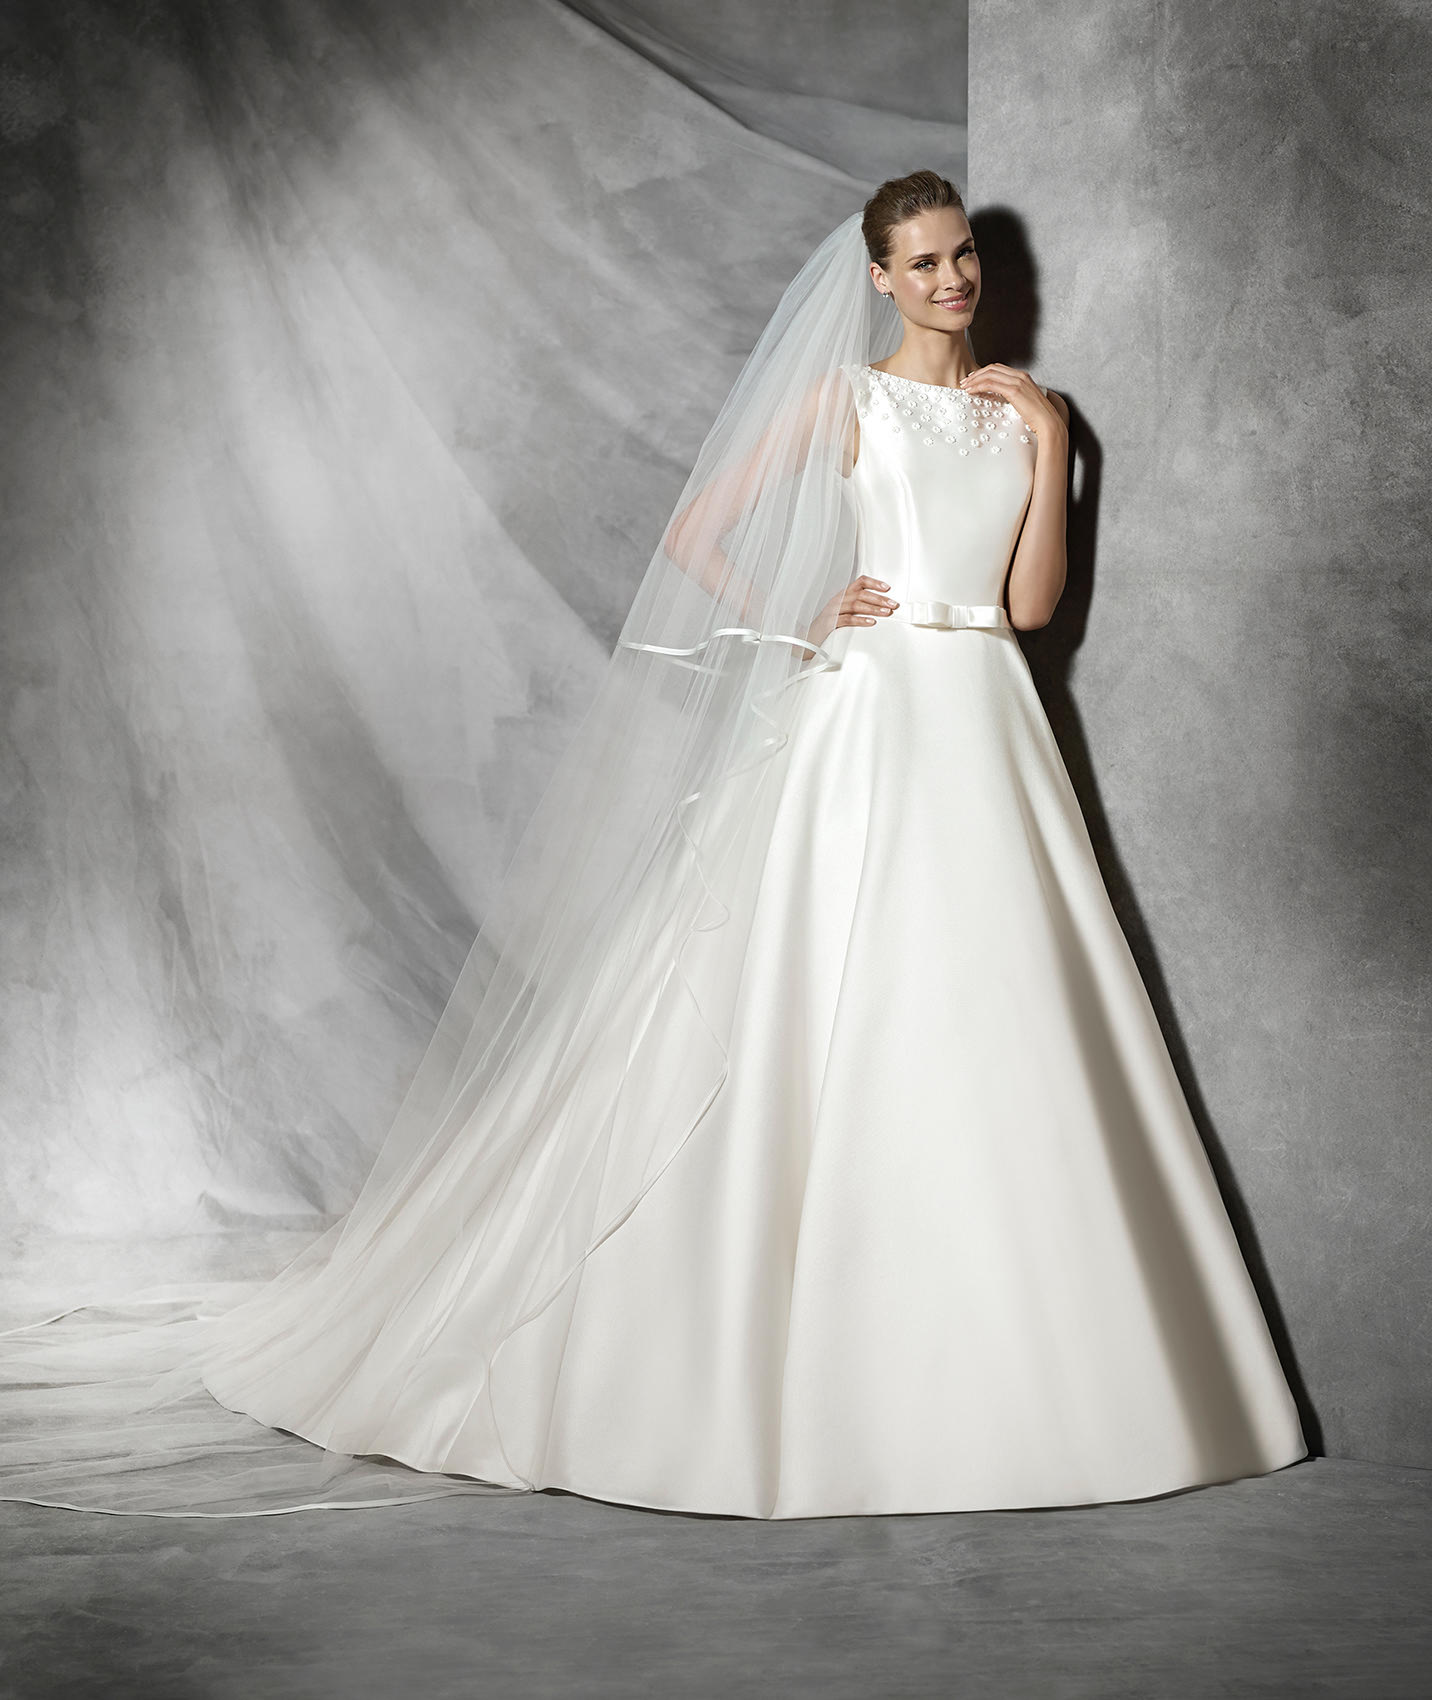 Vintage Wedding Dress - Pronovias Tresol Wedding Dress